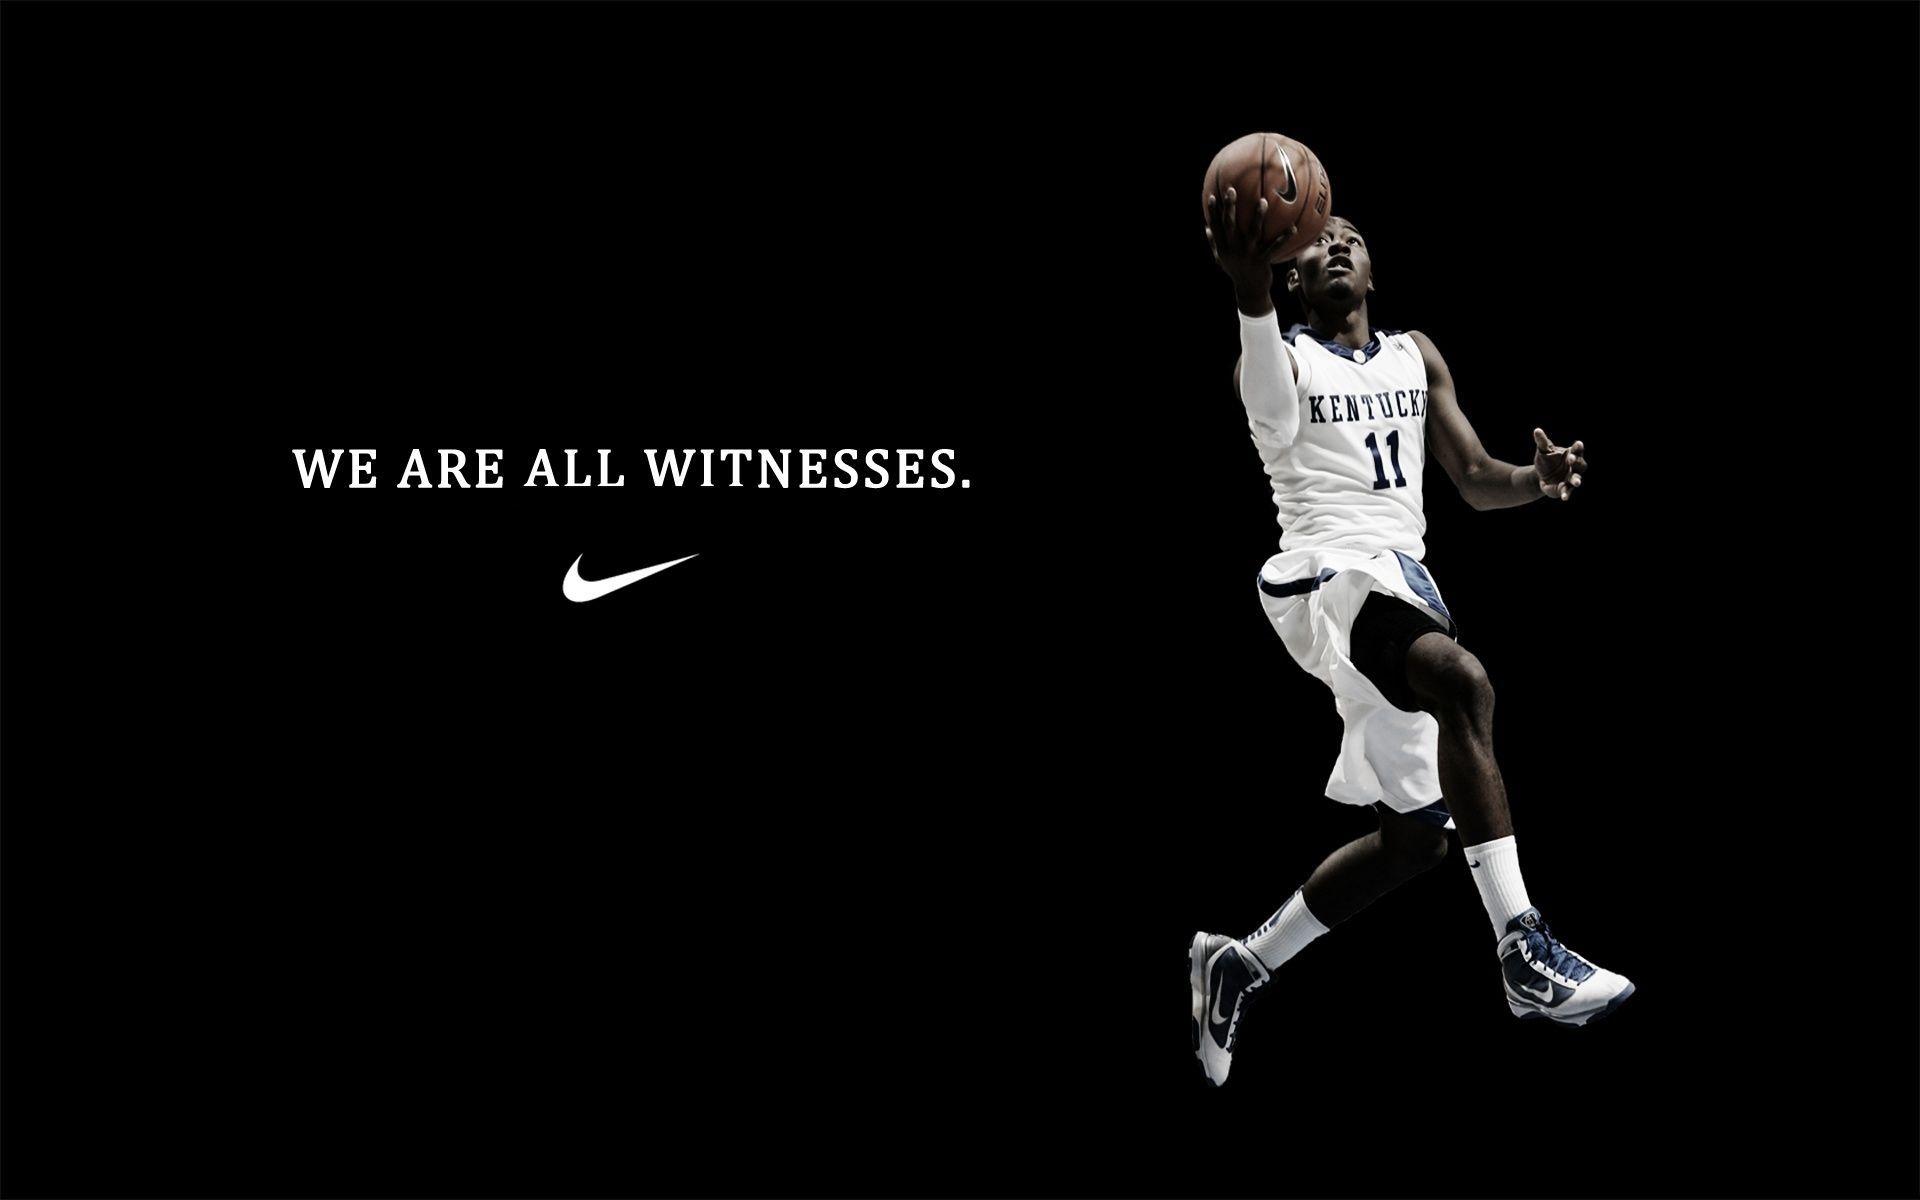 Nike Wallpapers Basketball Wallpaper Cave Basketball Wallpapers Hd Sports Wallpapers Basketball Wallpaper